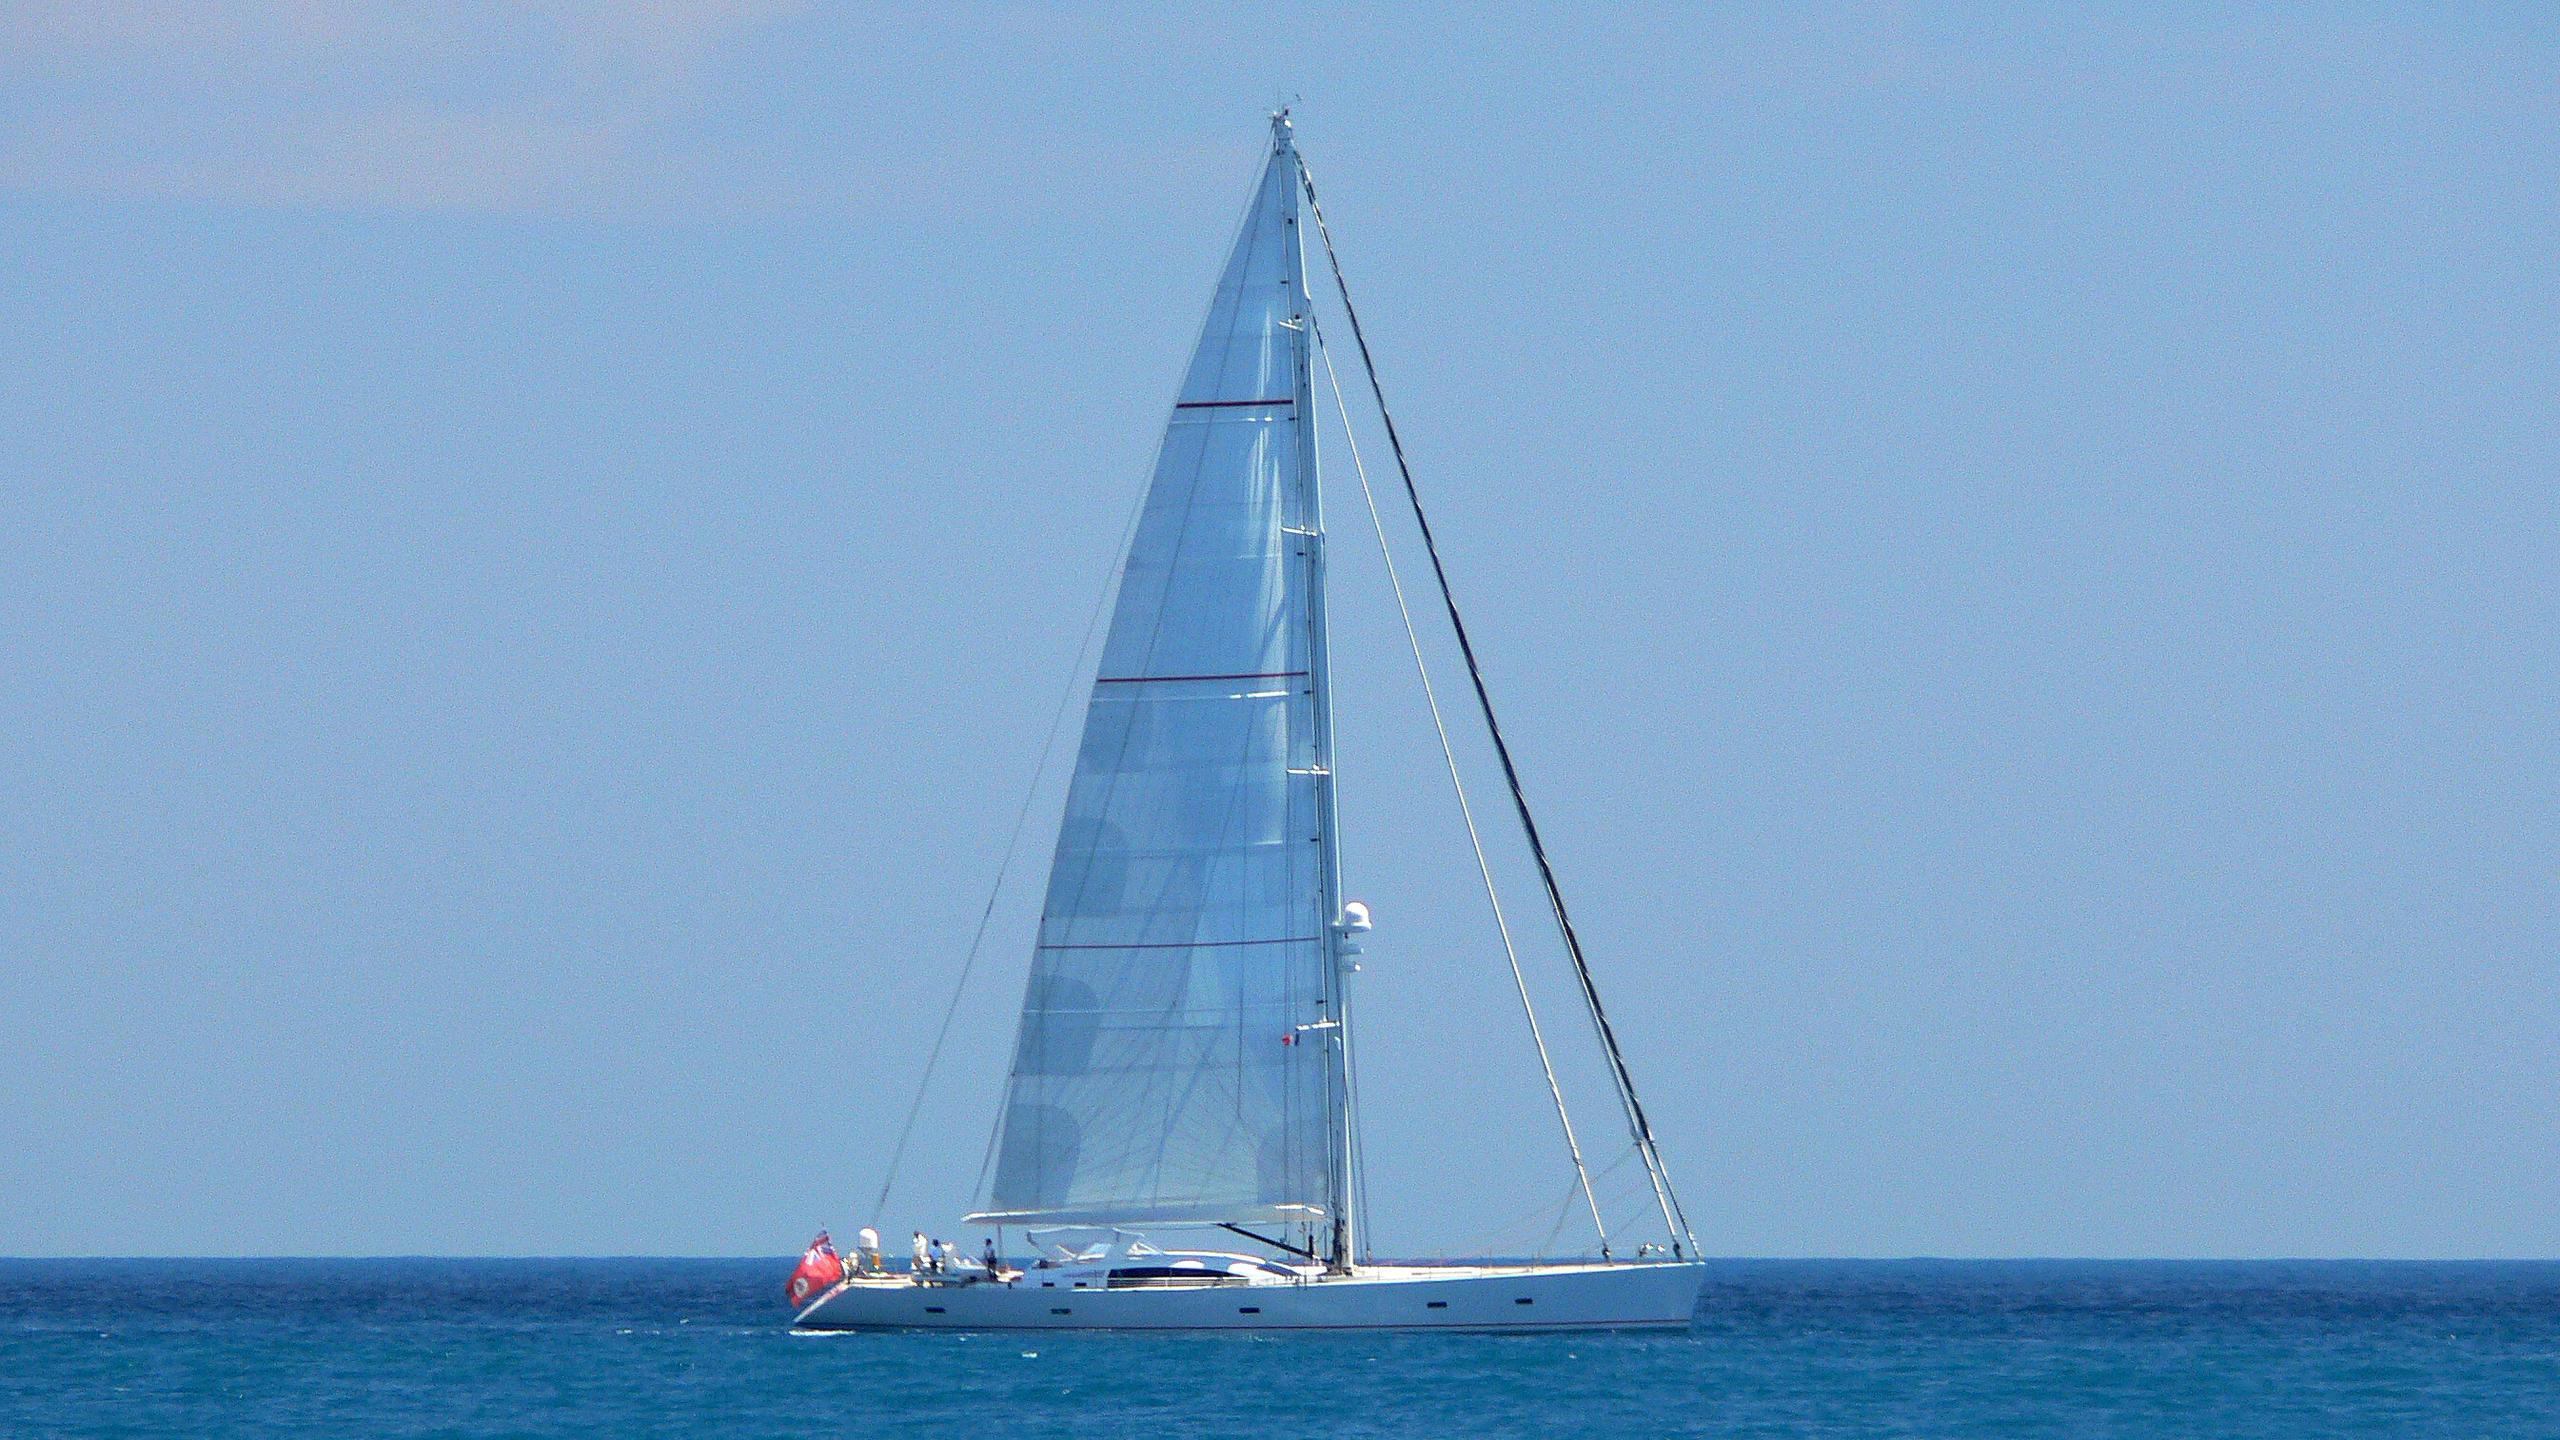 idle-sailing-yacht-cnb-105-2007-32m-profile